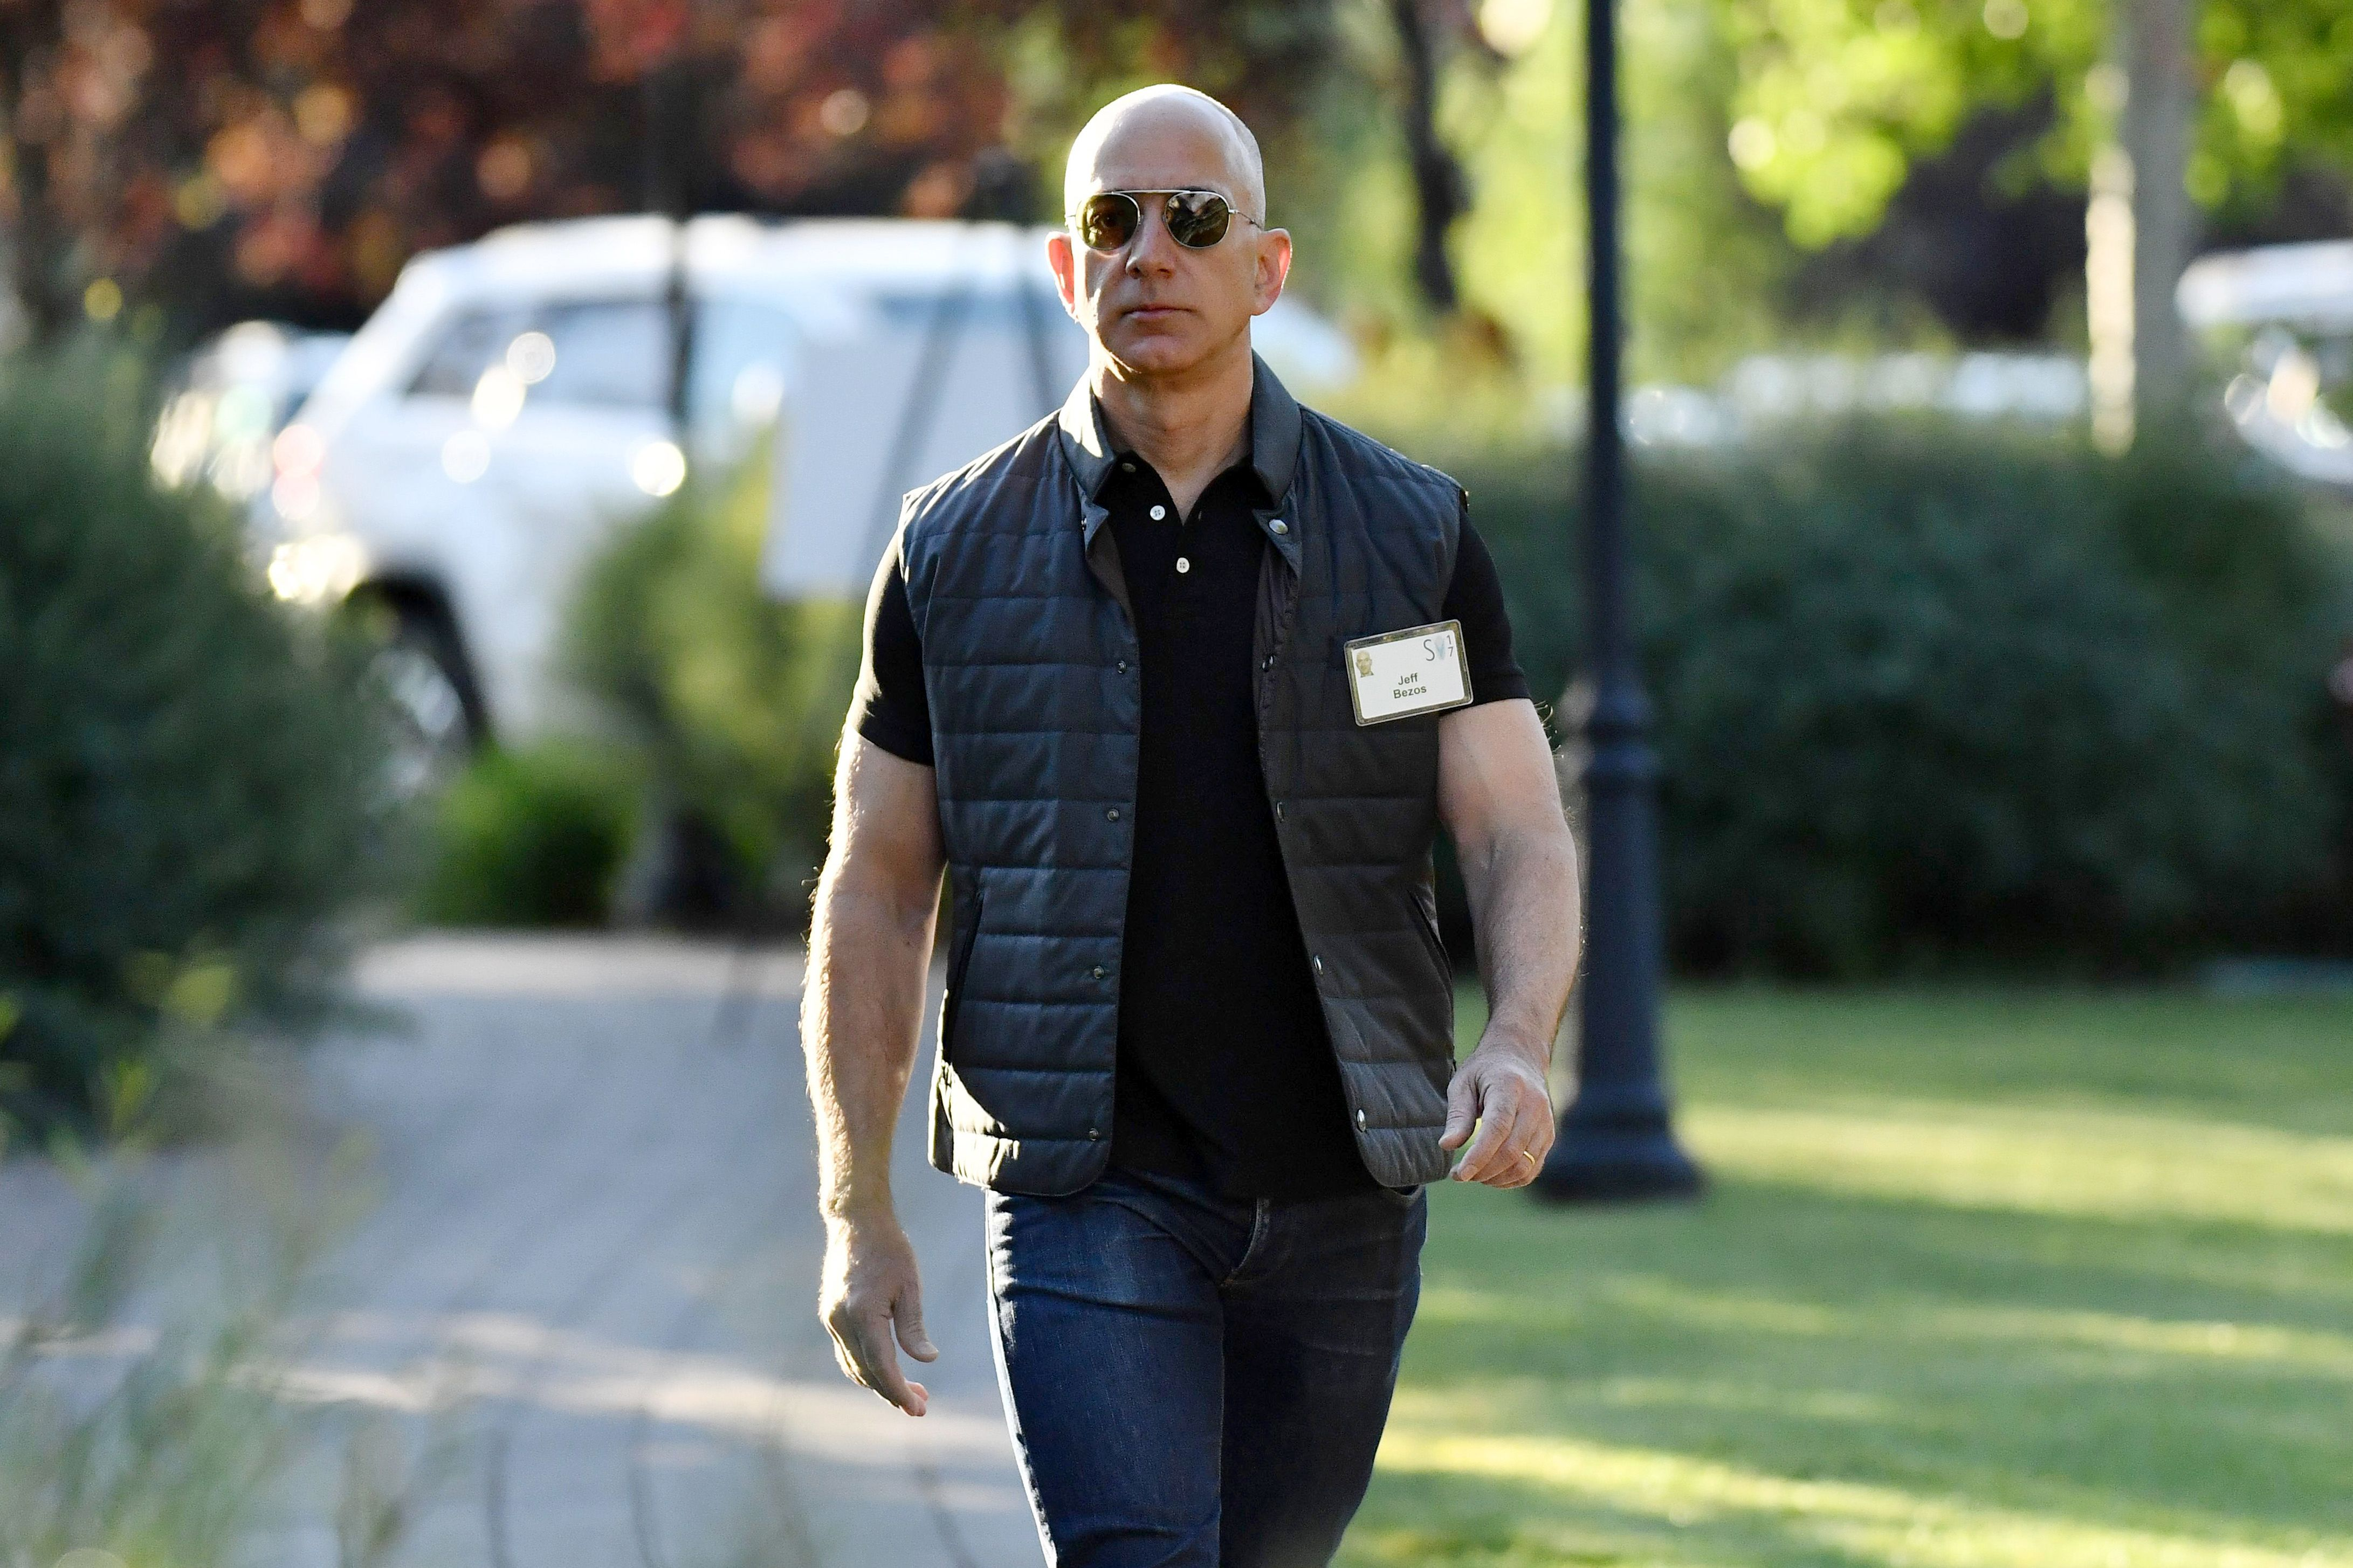 Jeff BezosAllen & Company Sun Valley Conference, Idaho, USA - 13 Jul 2017